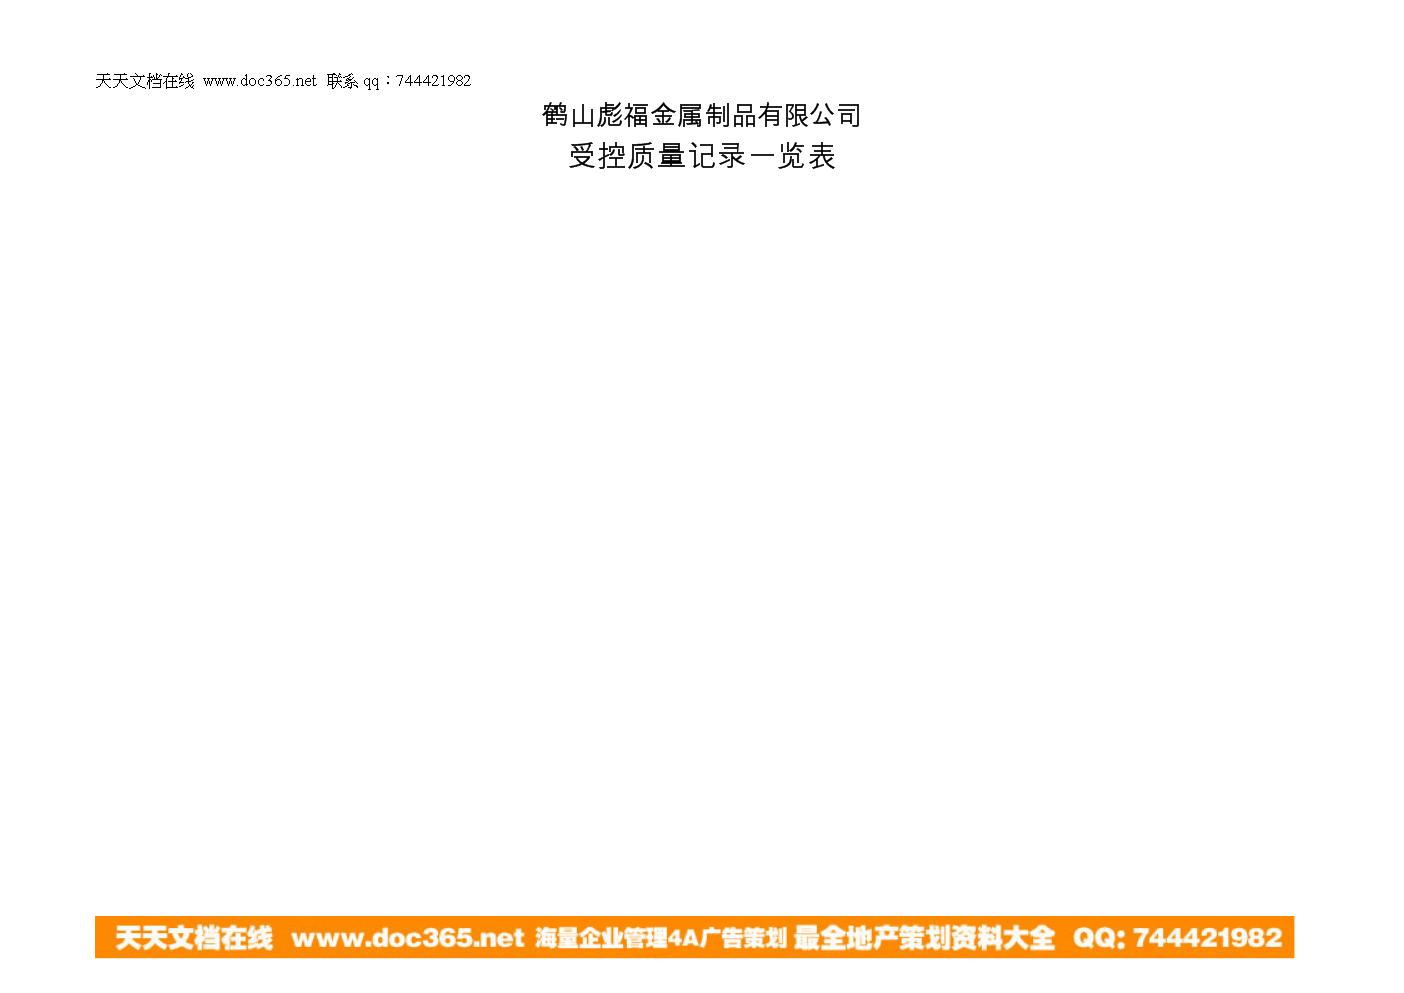 QJ007受控質量記錄一覽表.doc